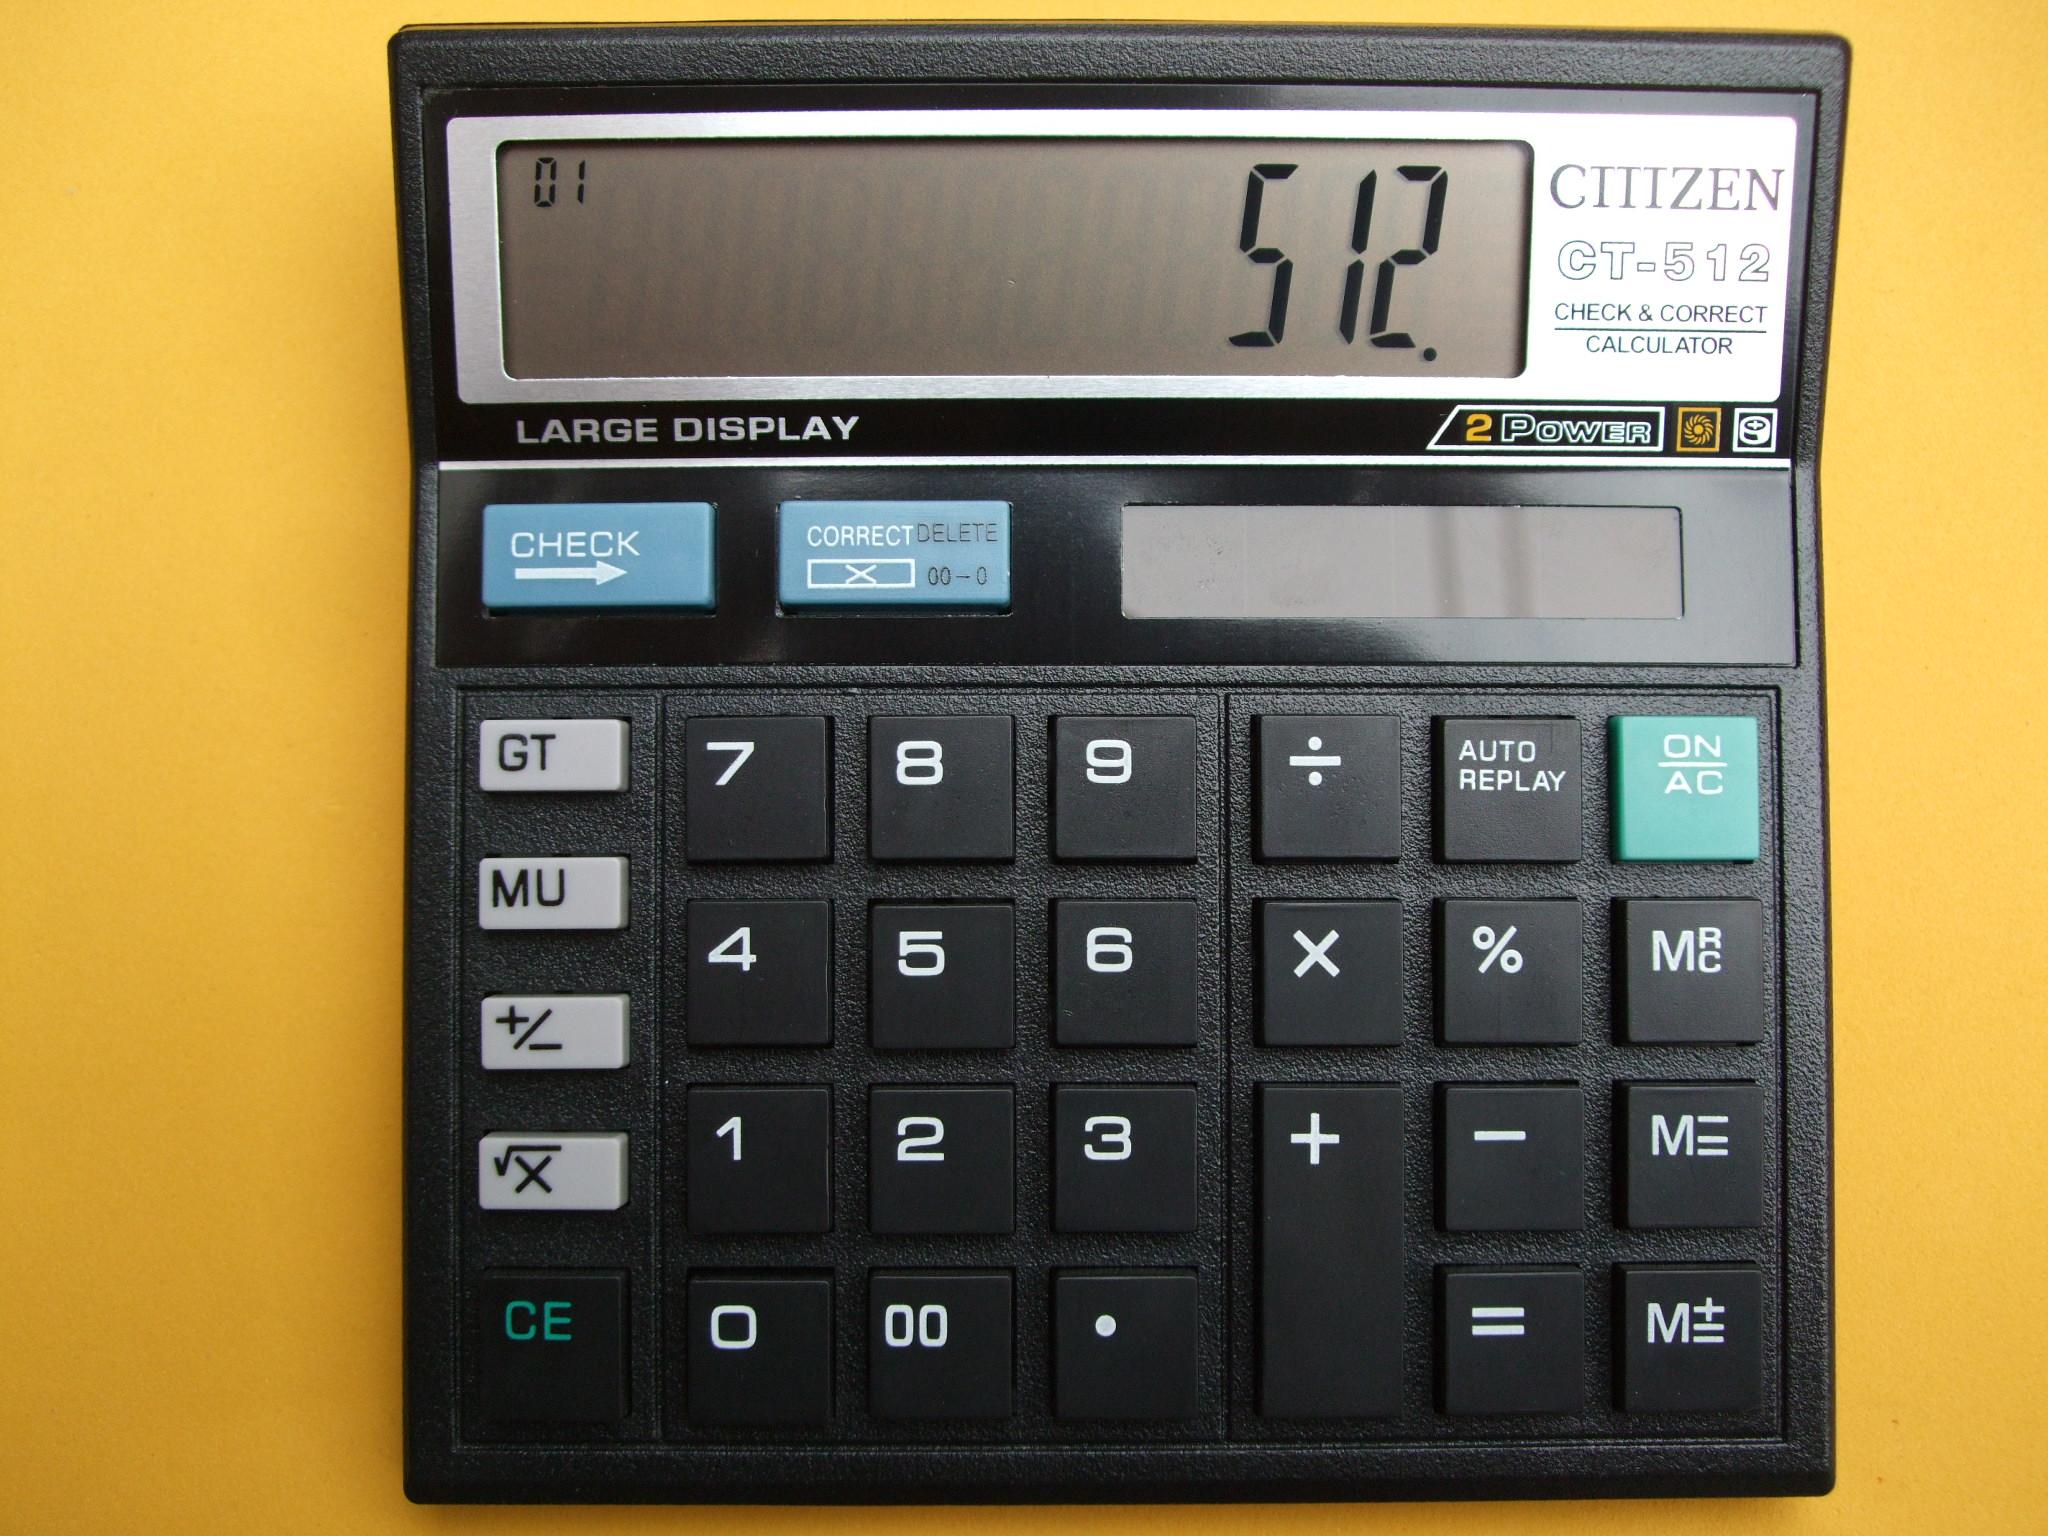 Usd 698 Wholesale Genuine West Rail City Ct 500 512 600 Calculator Citizen Lightbox Moreview